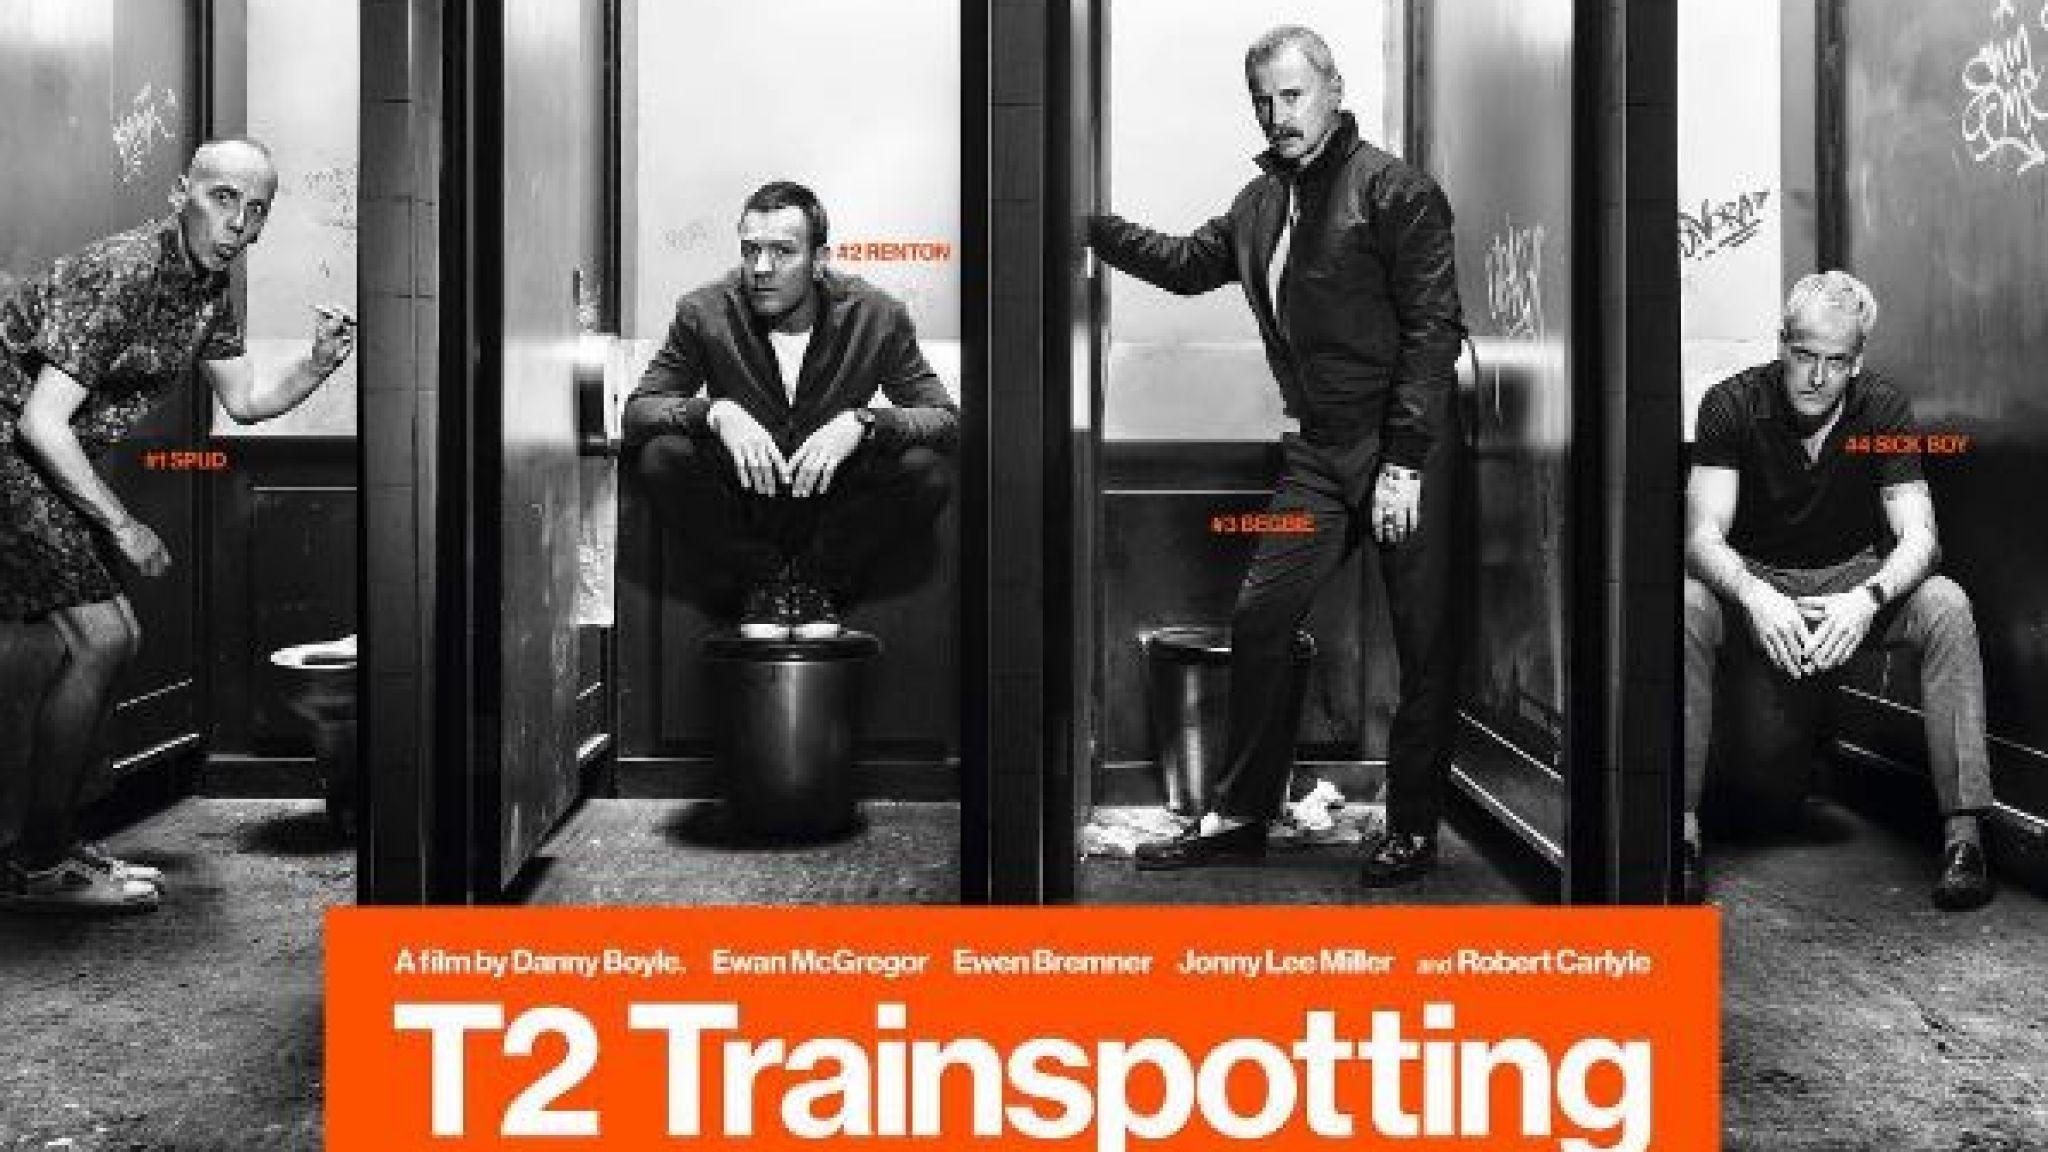 The film reunites Ewan McGregor, Johnny Lee Miller, Robert Carlyle and Ewen Bremner